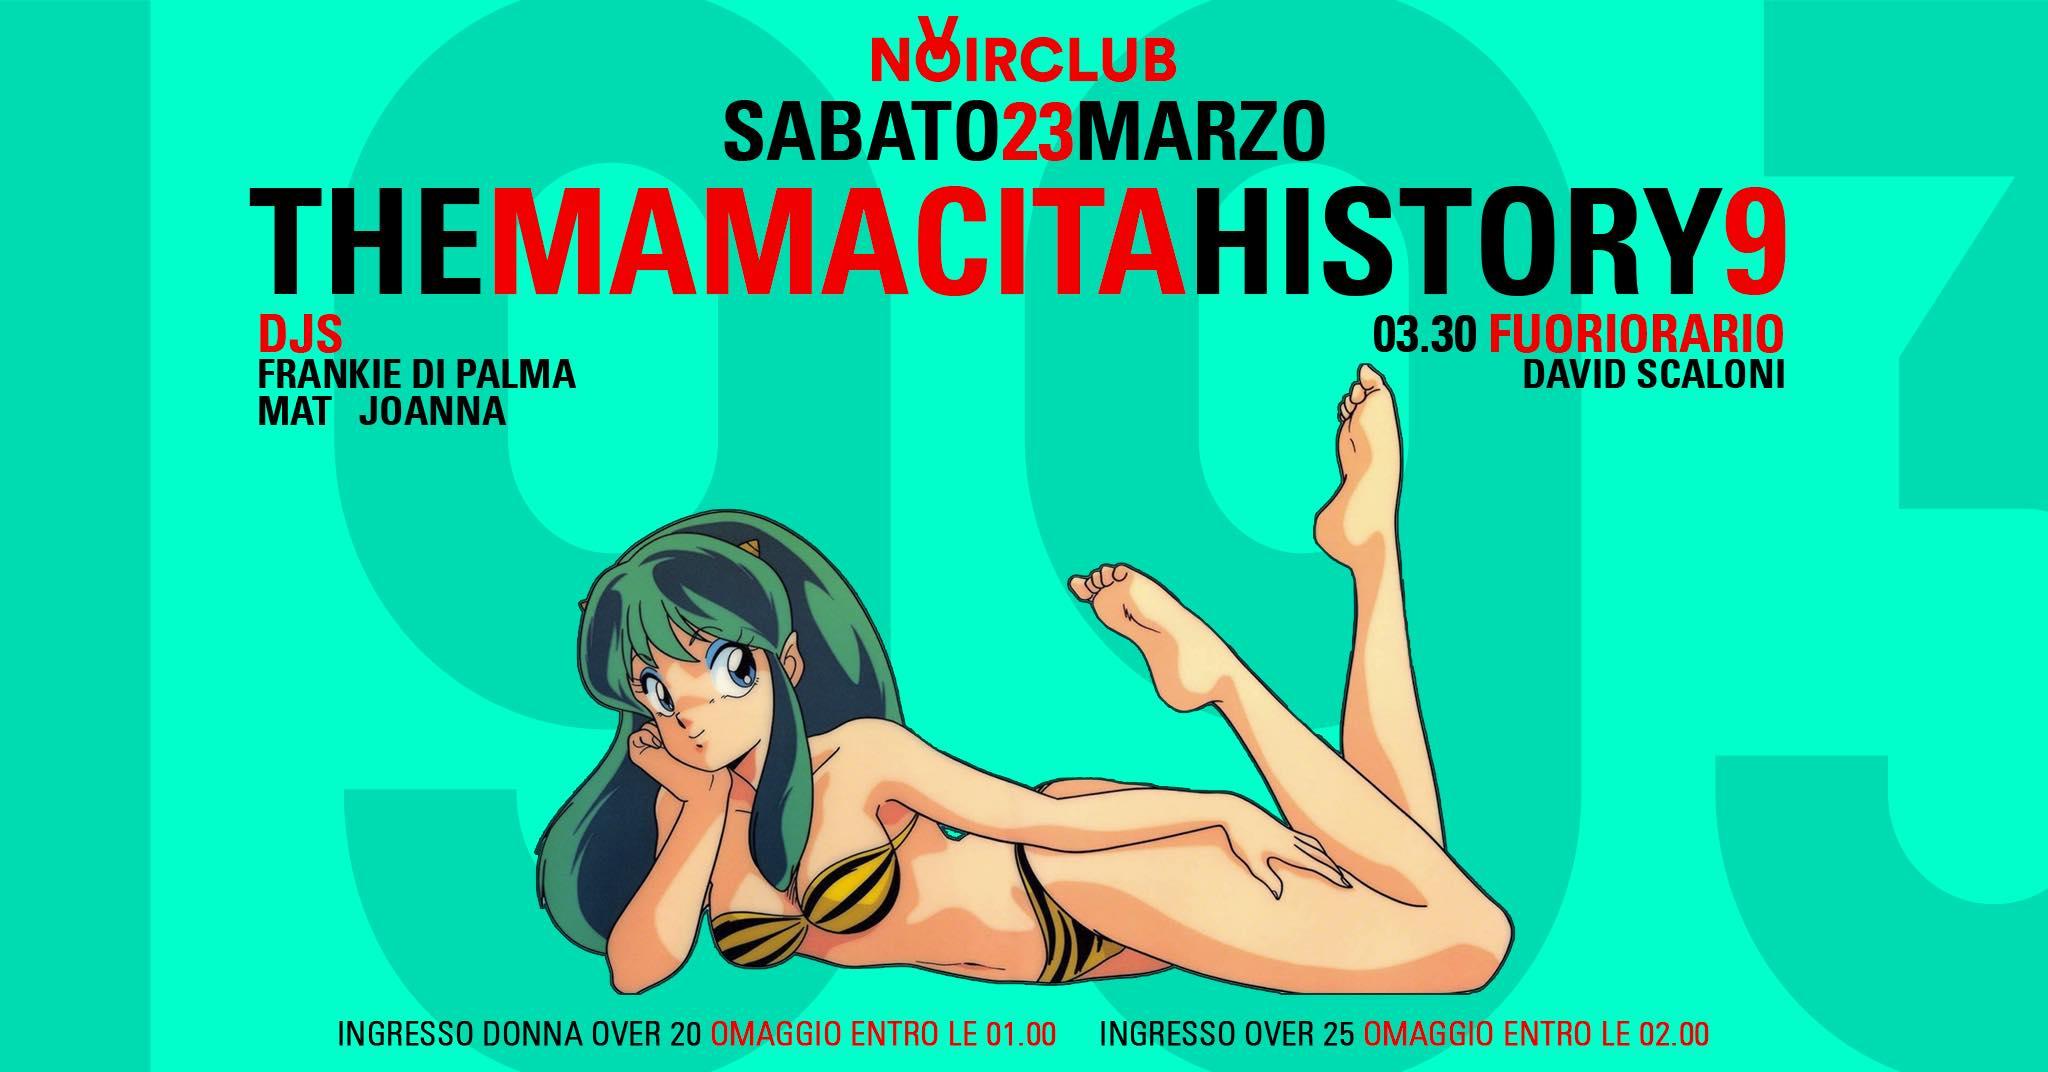 Noir Club Jesi The Mamacita History 9